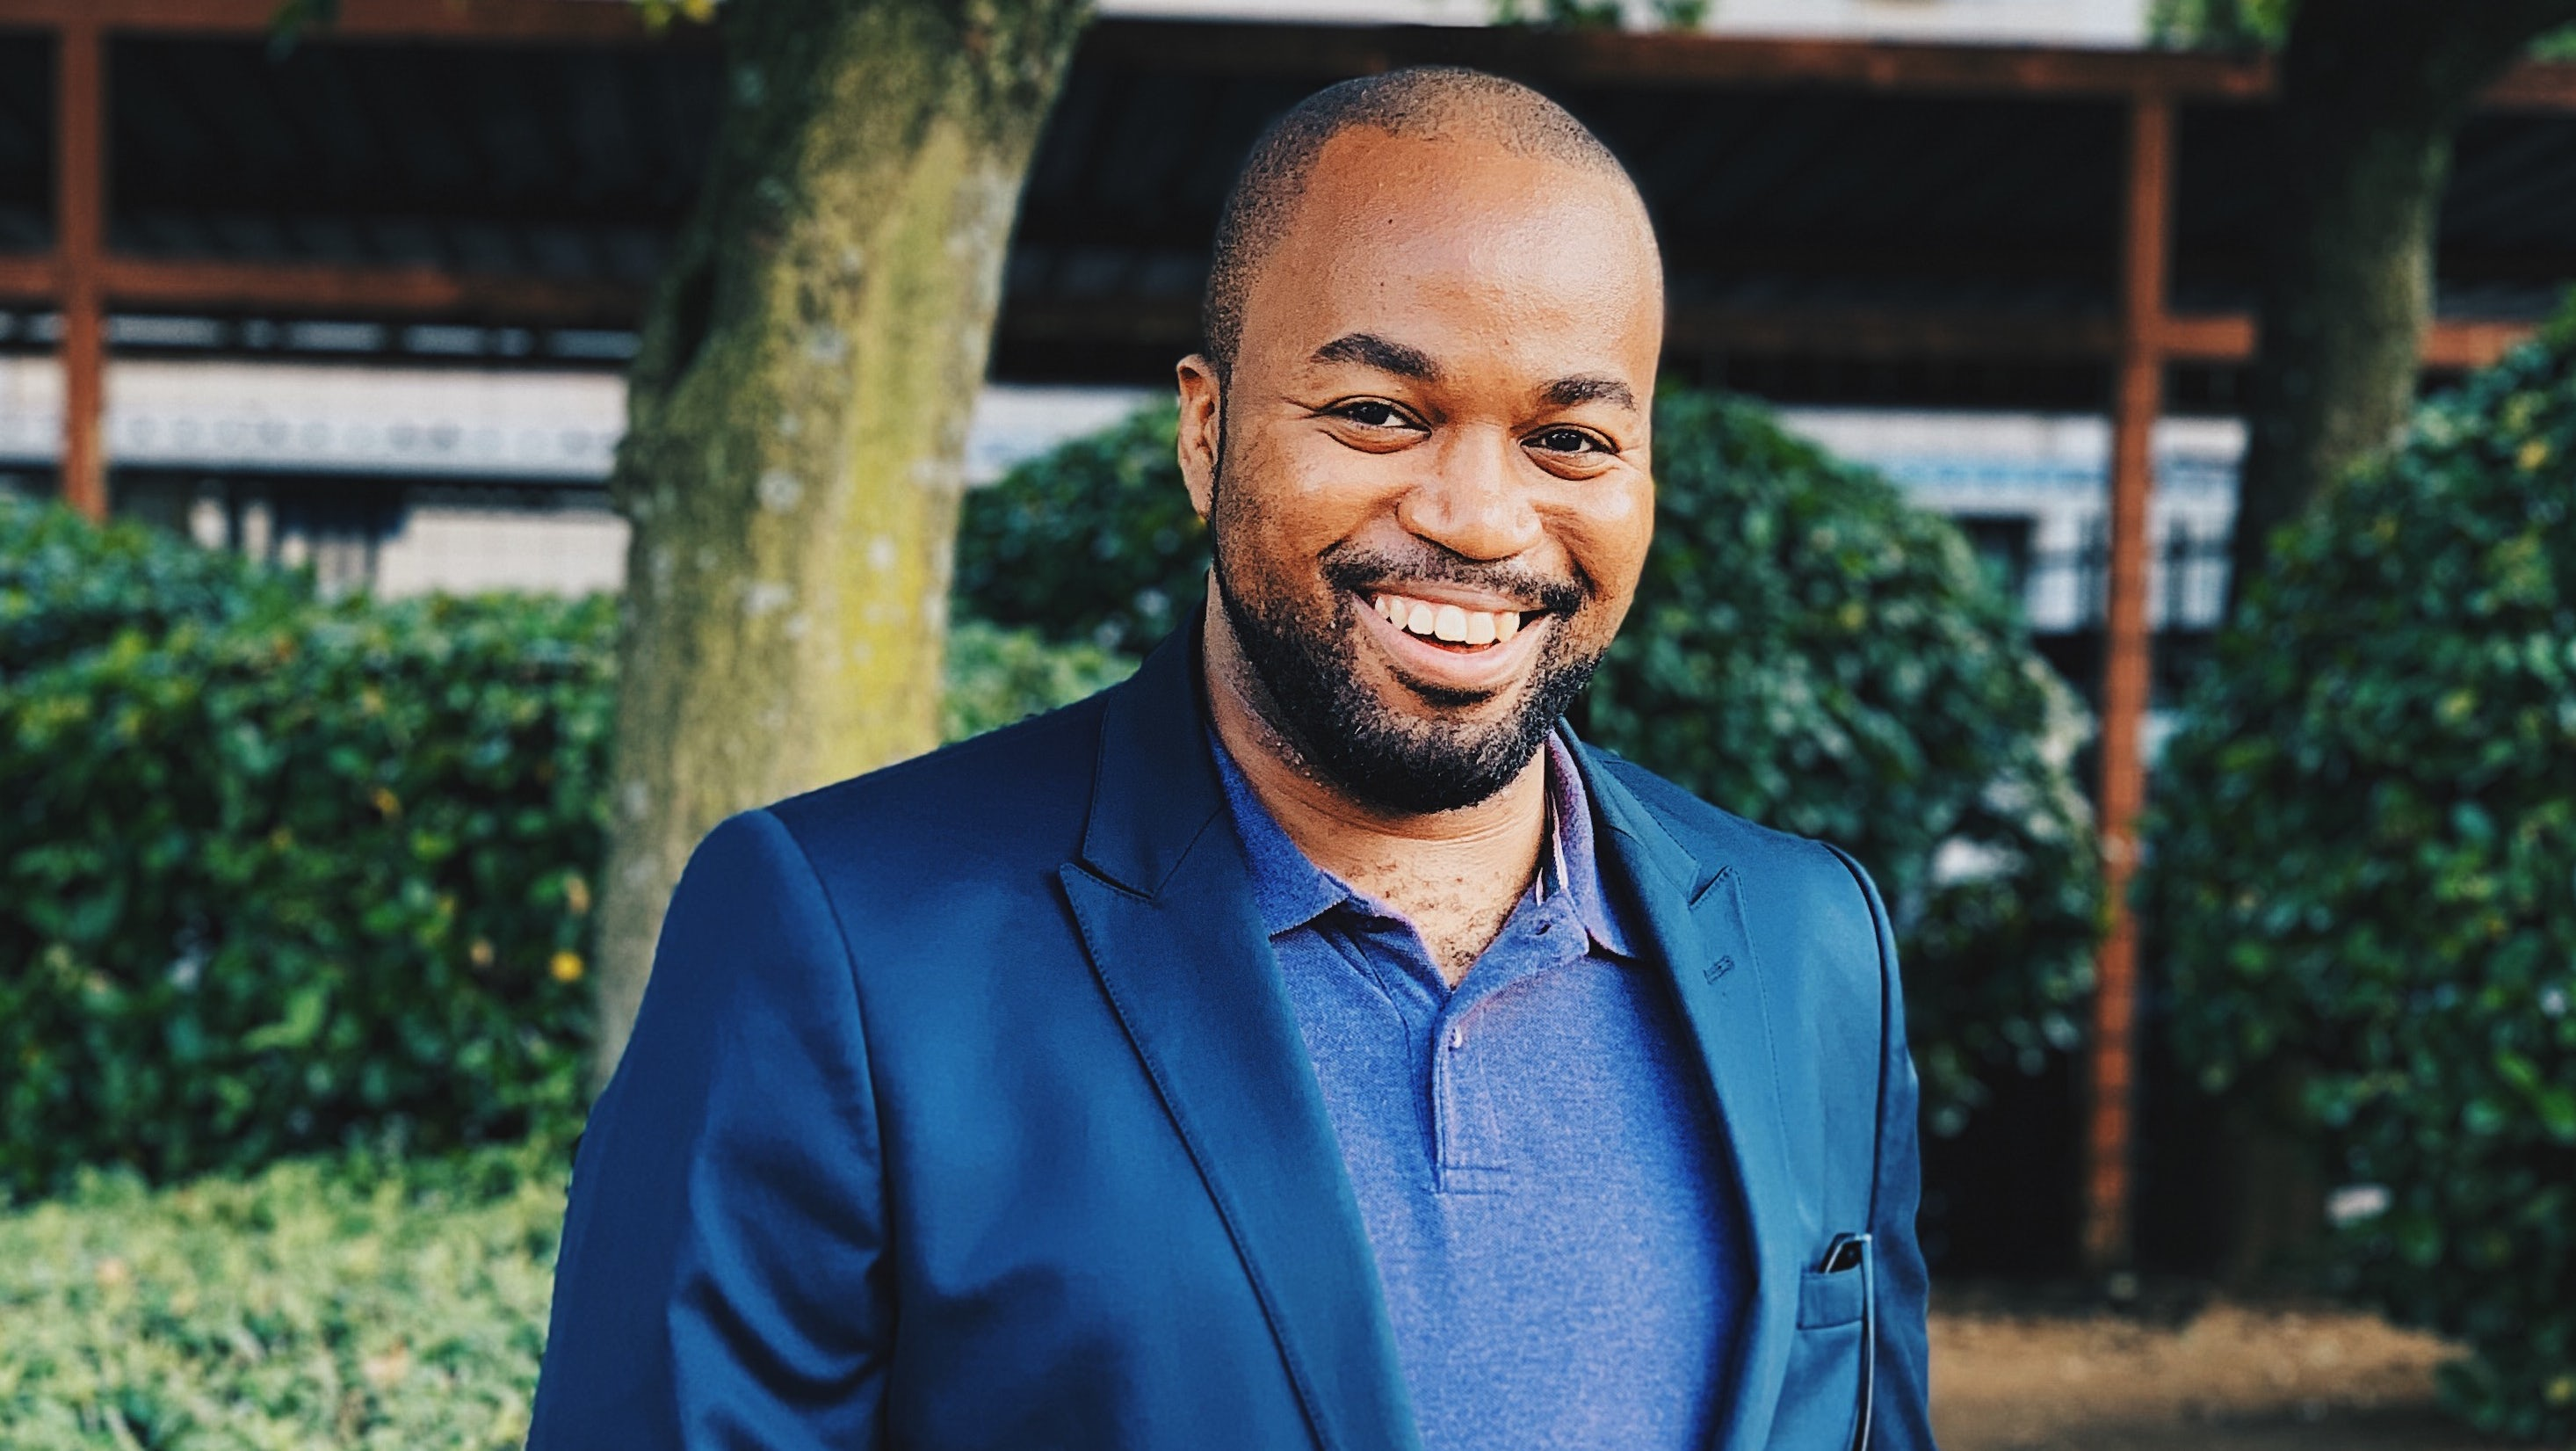 Community Spotlight | Nkosiyati Khumalo: 'Fashion Needs to Include More Diverse Voices'